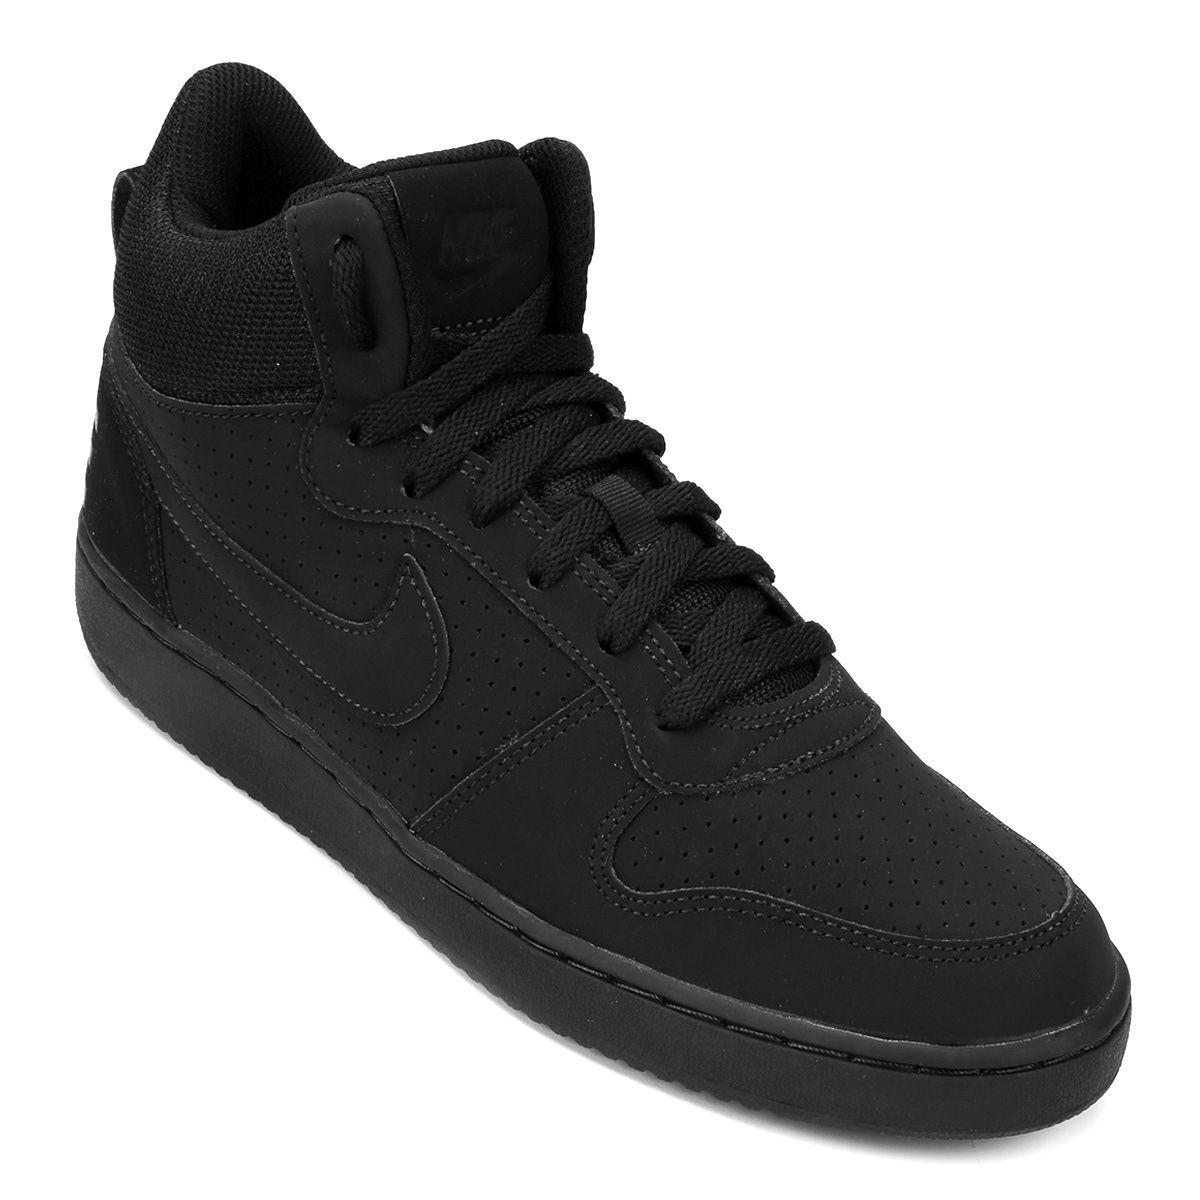 3b6cbf066 Tênis Couro Cano Alto Nike Recreation Mid Masculino - Compre Agora |  Netshoes